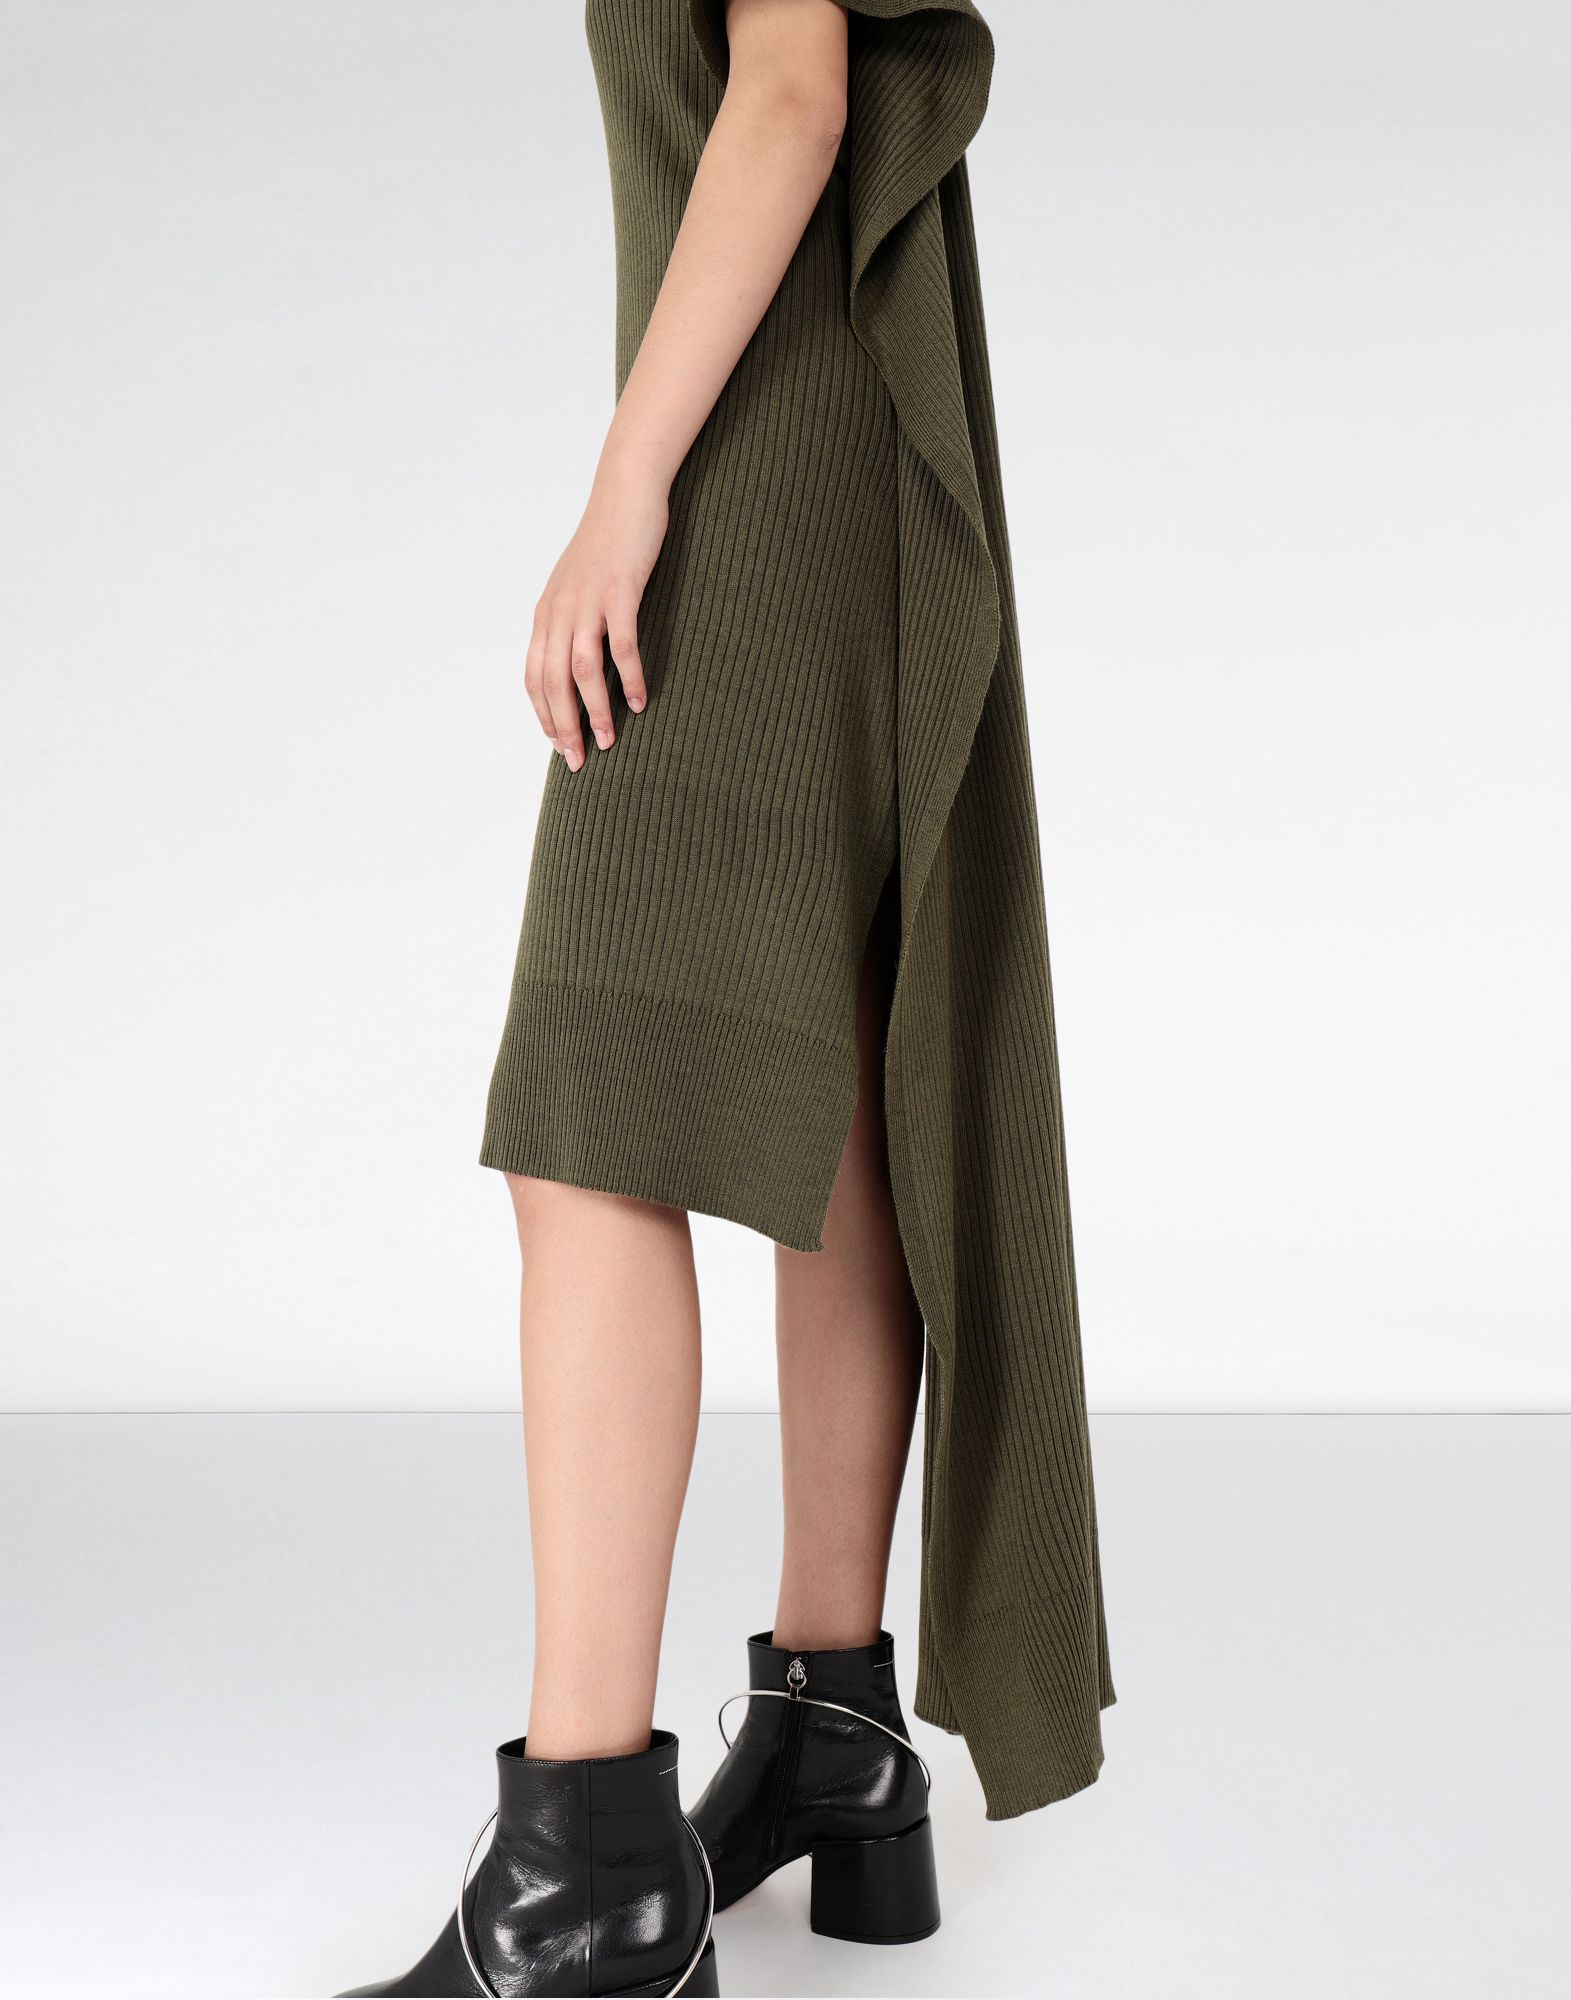 MM6 MAISON MARGIELA Knitwear polo neck dress Long dress Woman a